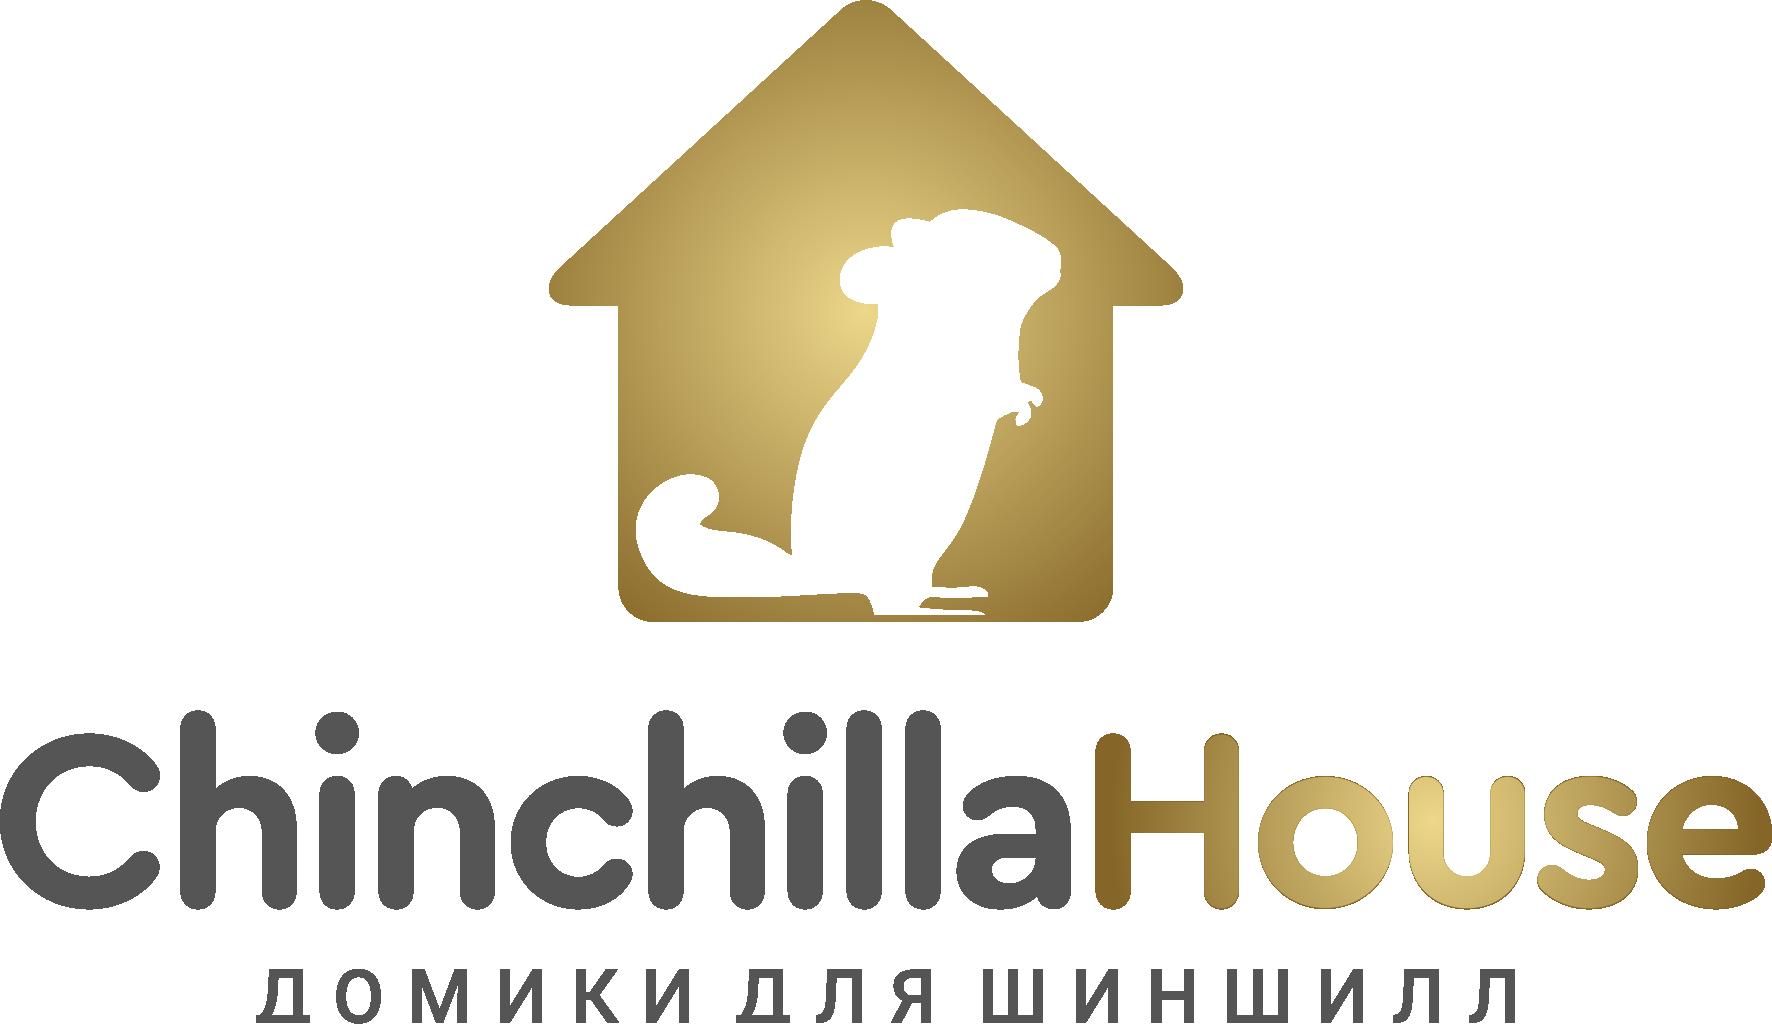 Chinchillahouse - Домики для Шиншилл